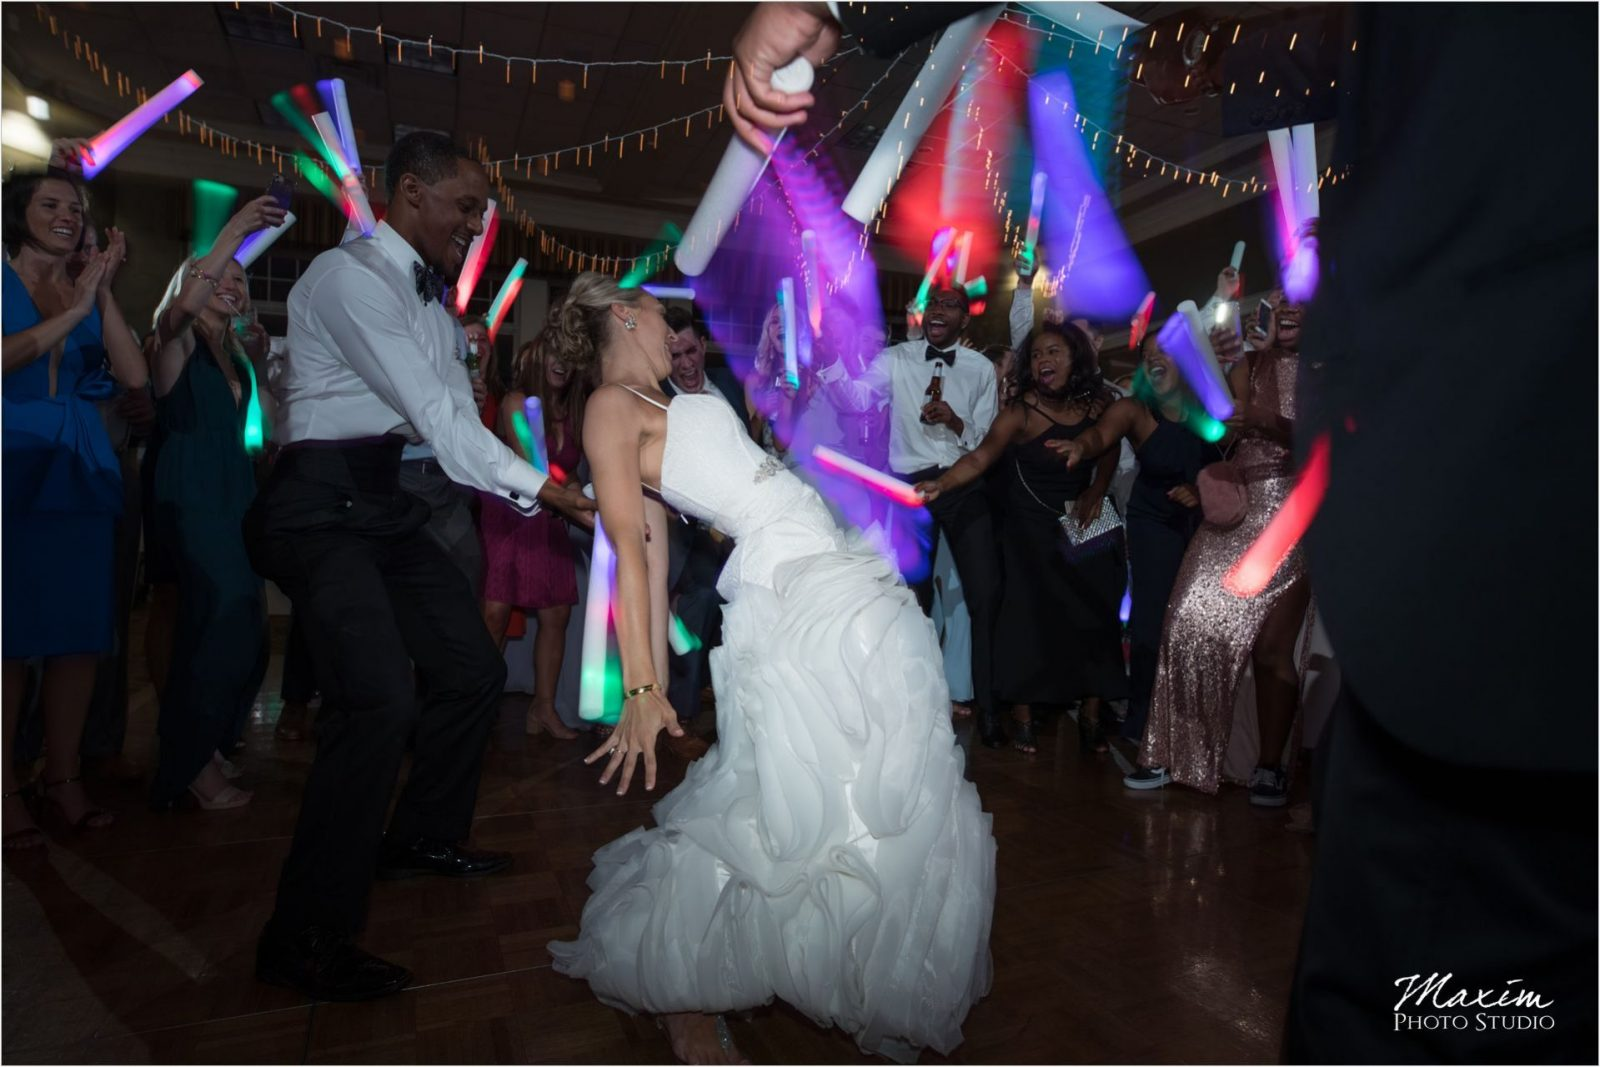 Cincinnati Wedding Photography Drees Pavilion Wedding Reception Glowsticks